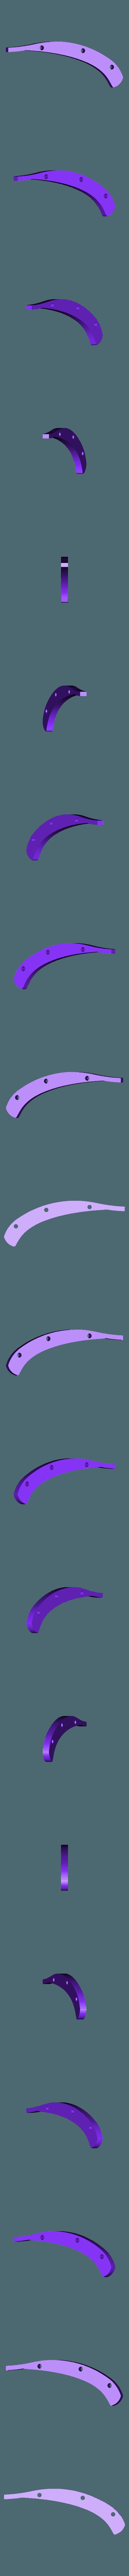 plaque_centrale.stl Download free STL file Folding Astroller knife with locking catch • 3D printer design, NOP21